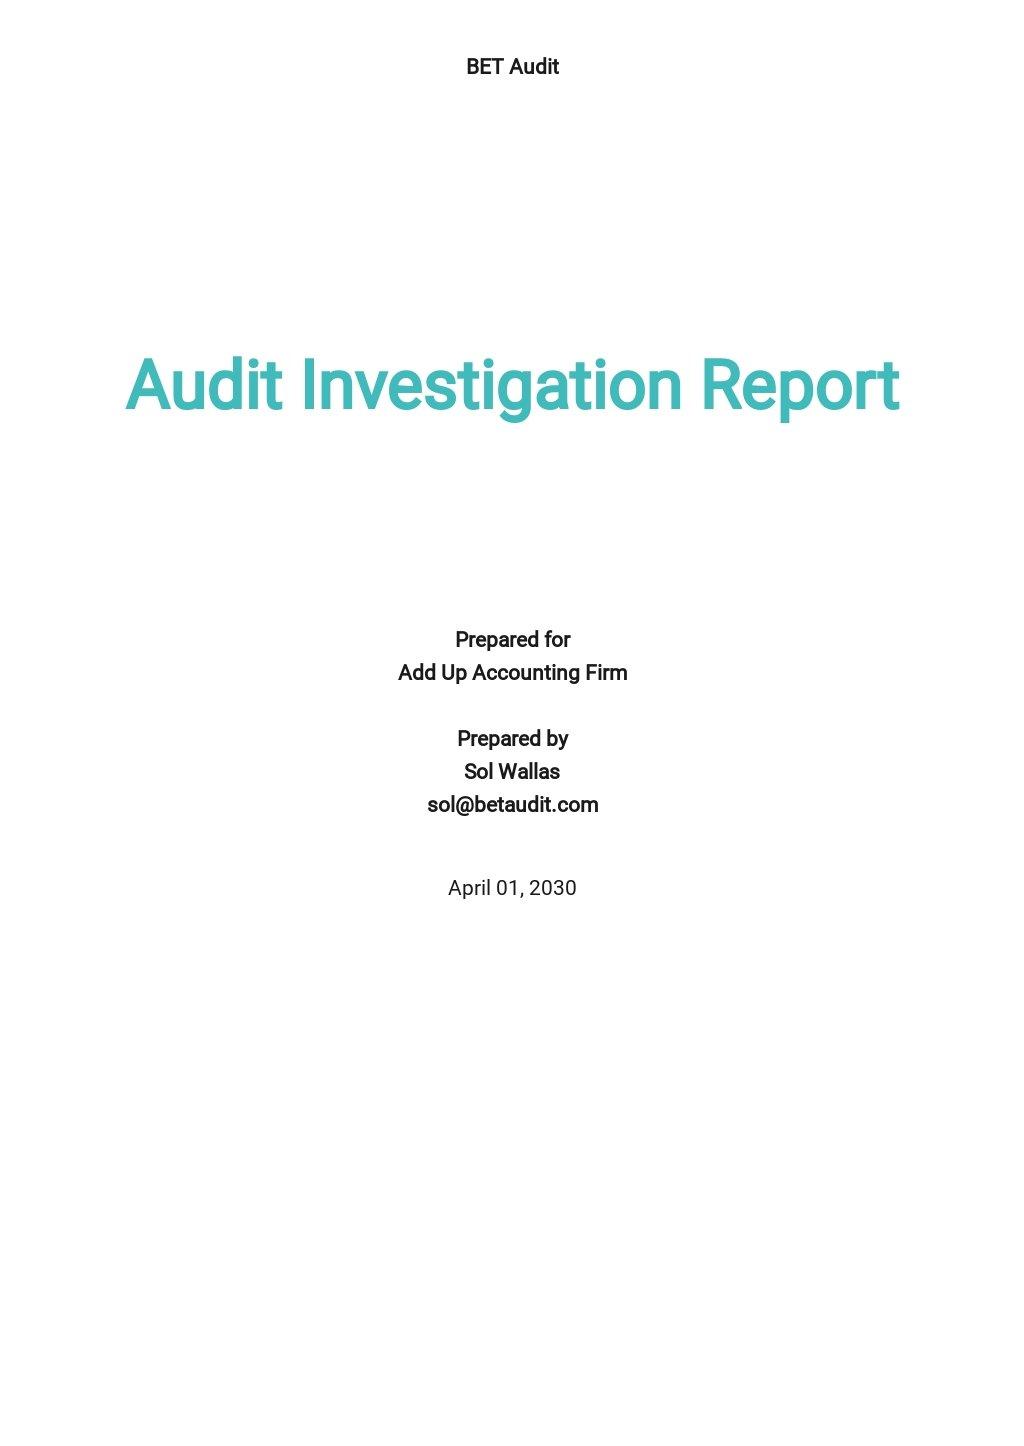 Audit Investigation Report Template